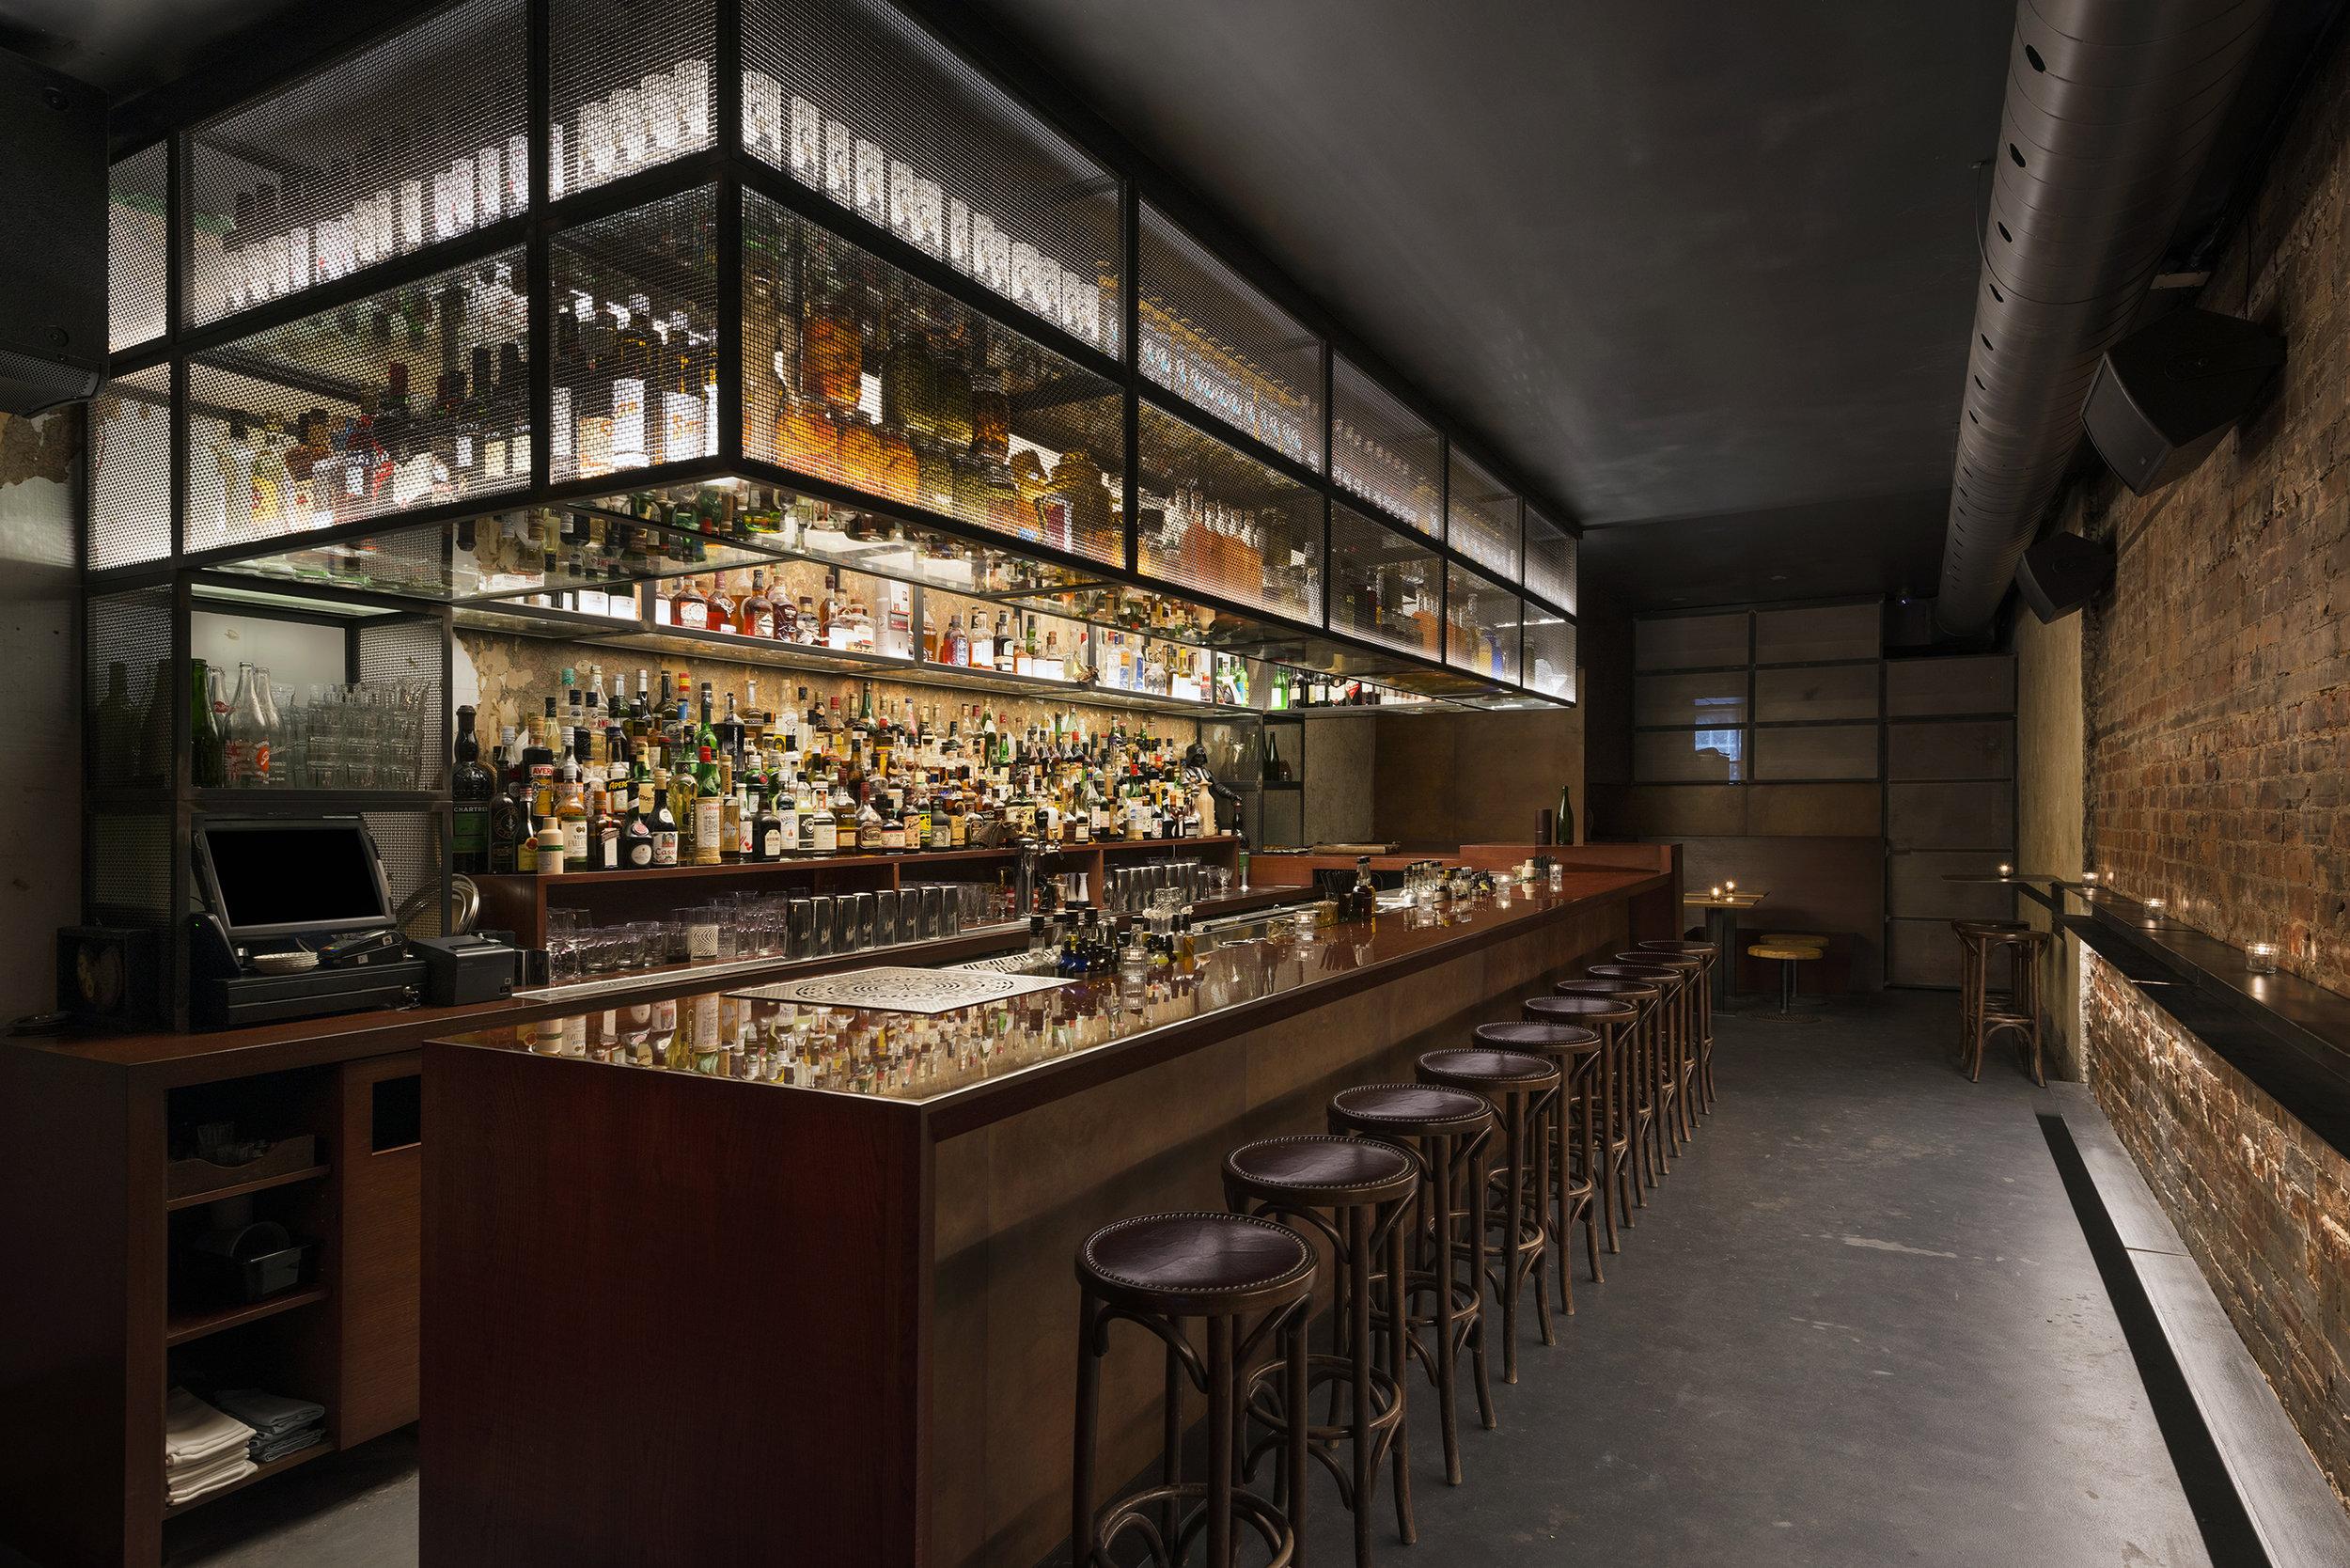 Restaurant Interior Photography